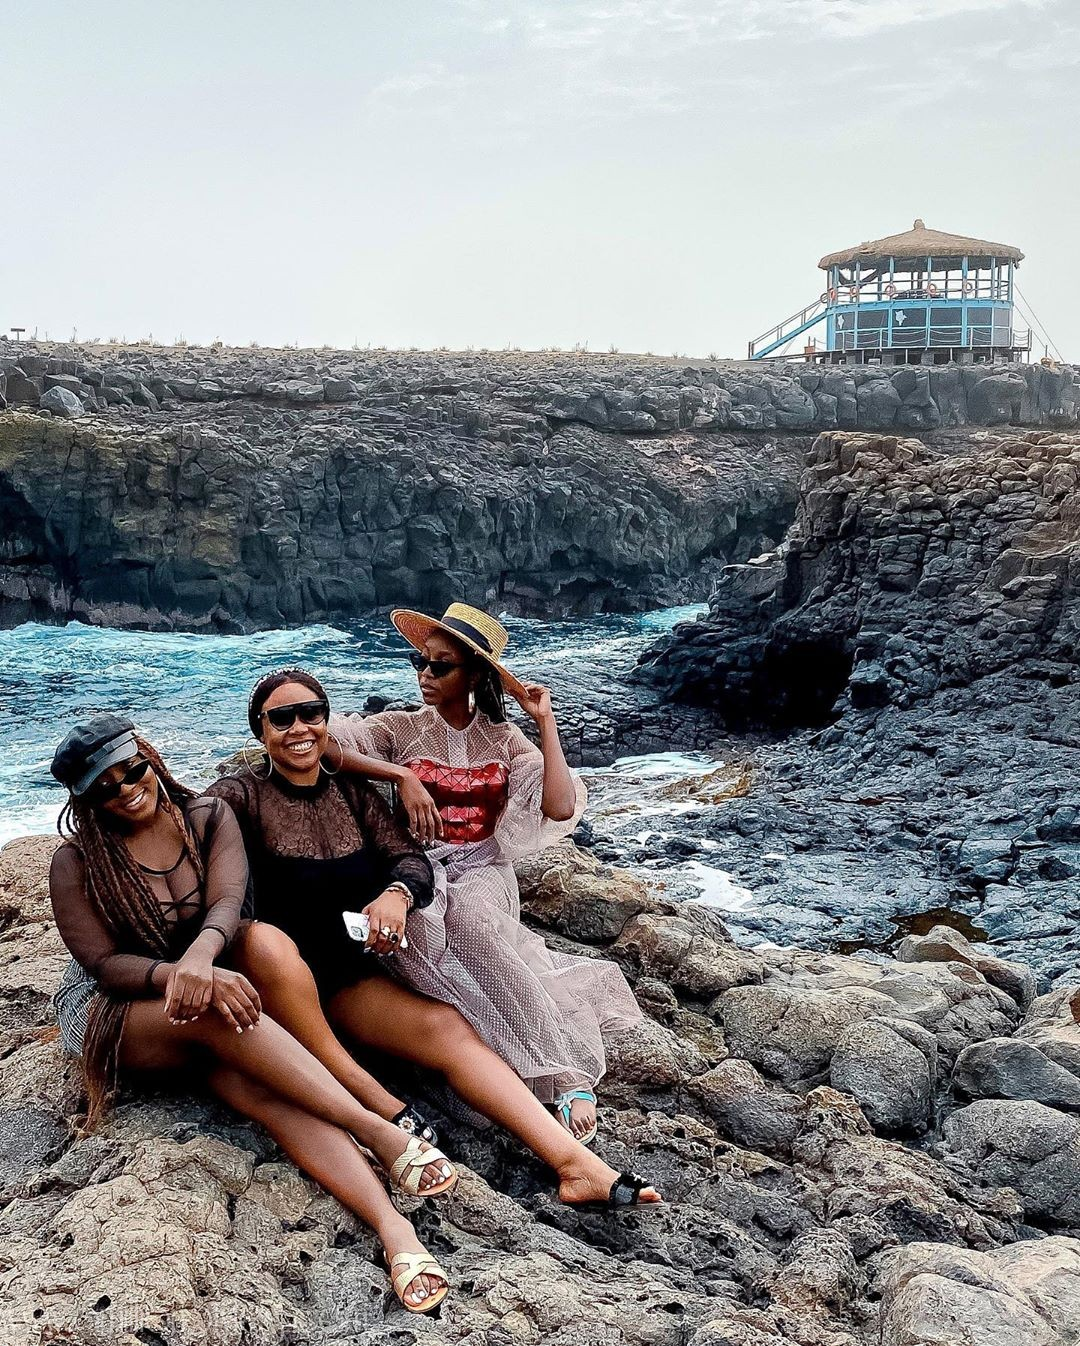 Ini Dima Okogie Serves Hawt Vacation Style!